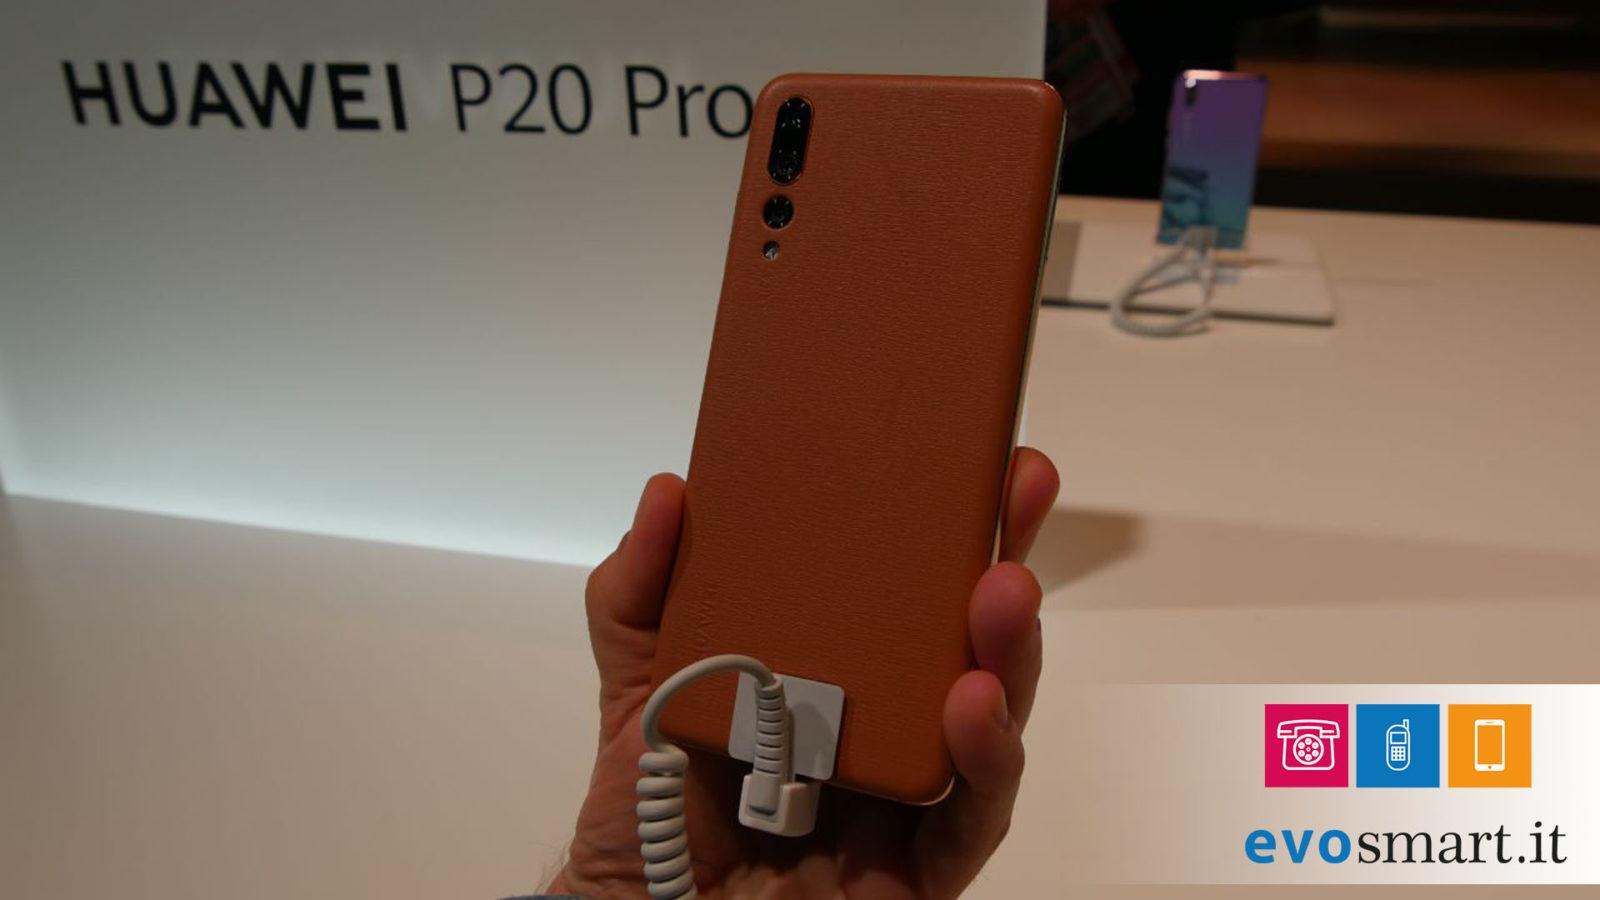 IFA 2018 | I 4 nuovi colori di Huawei P20 Pro | Evosmart.it